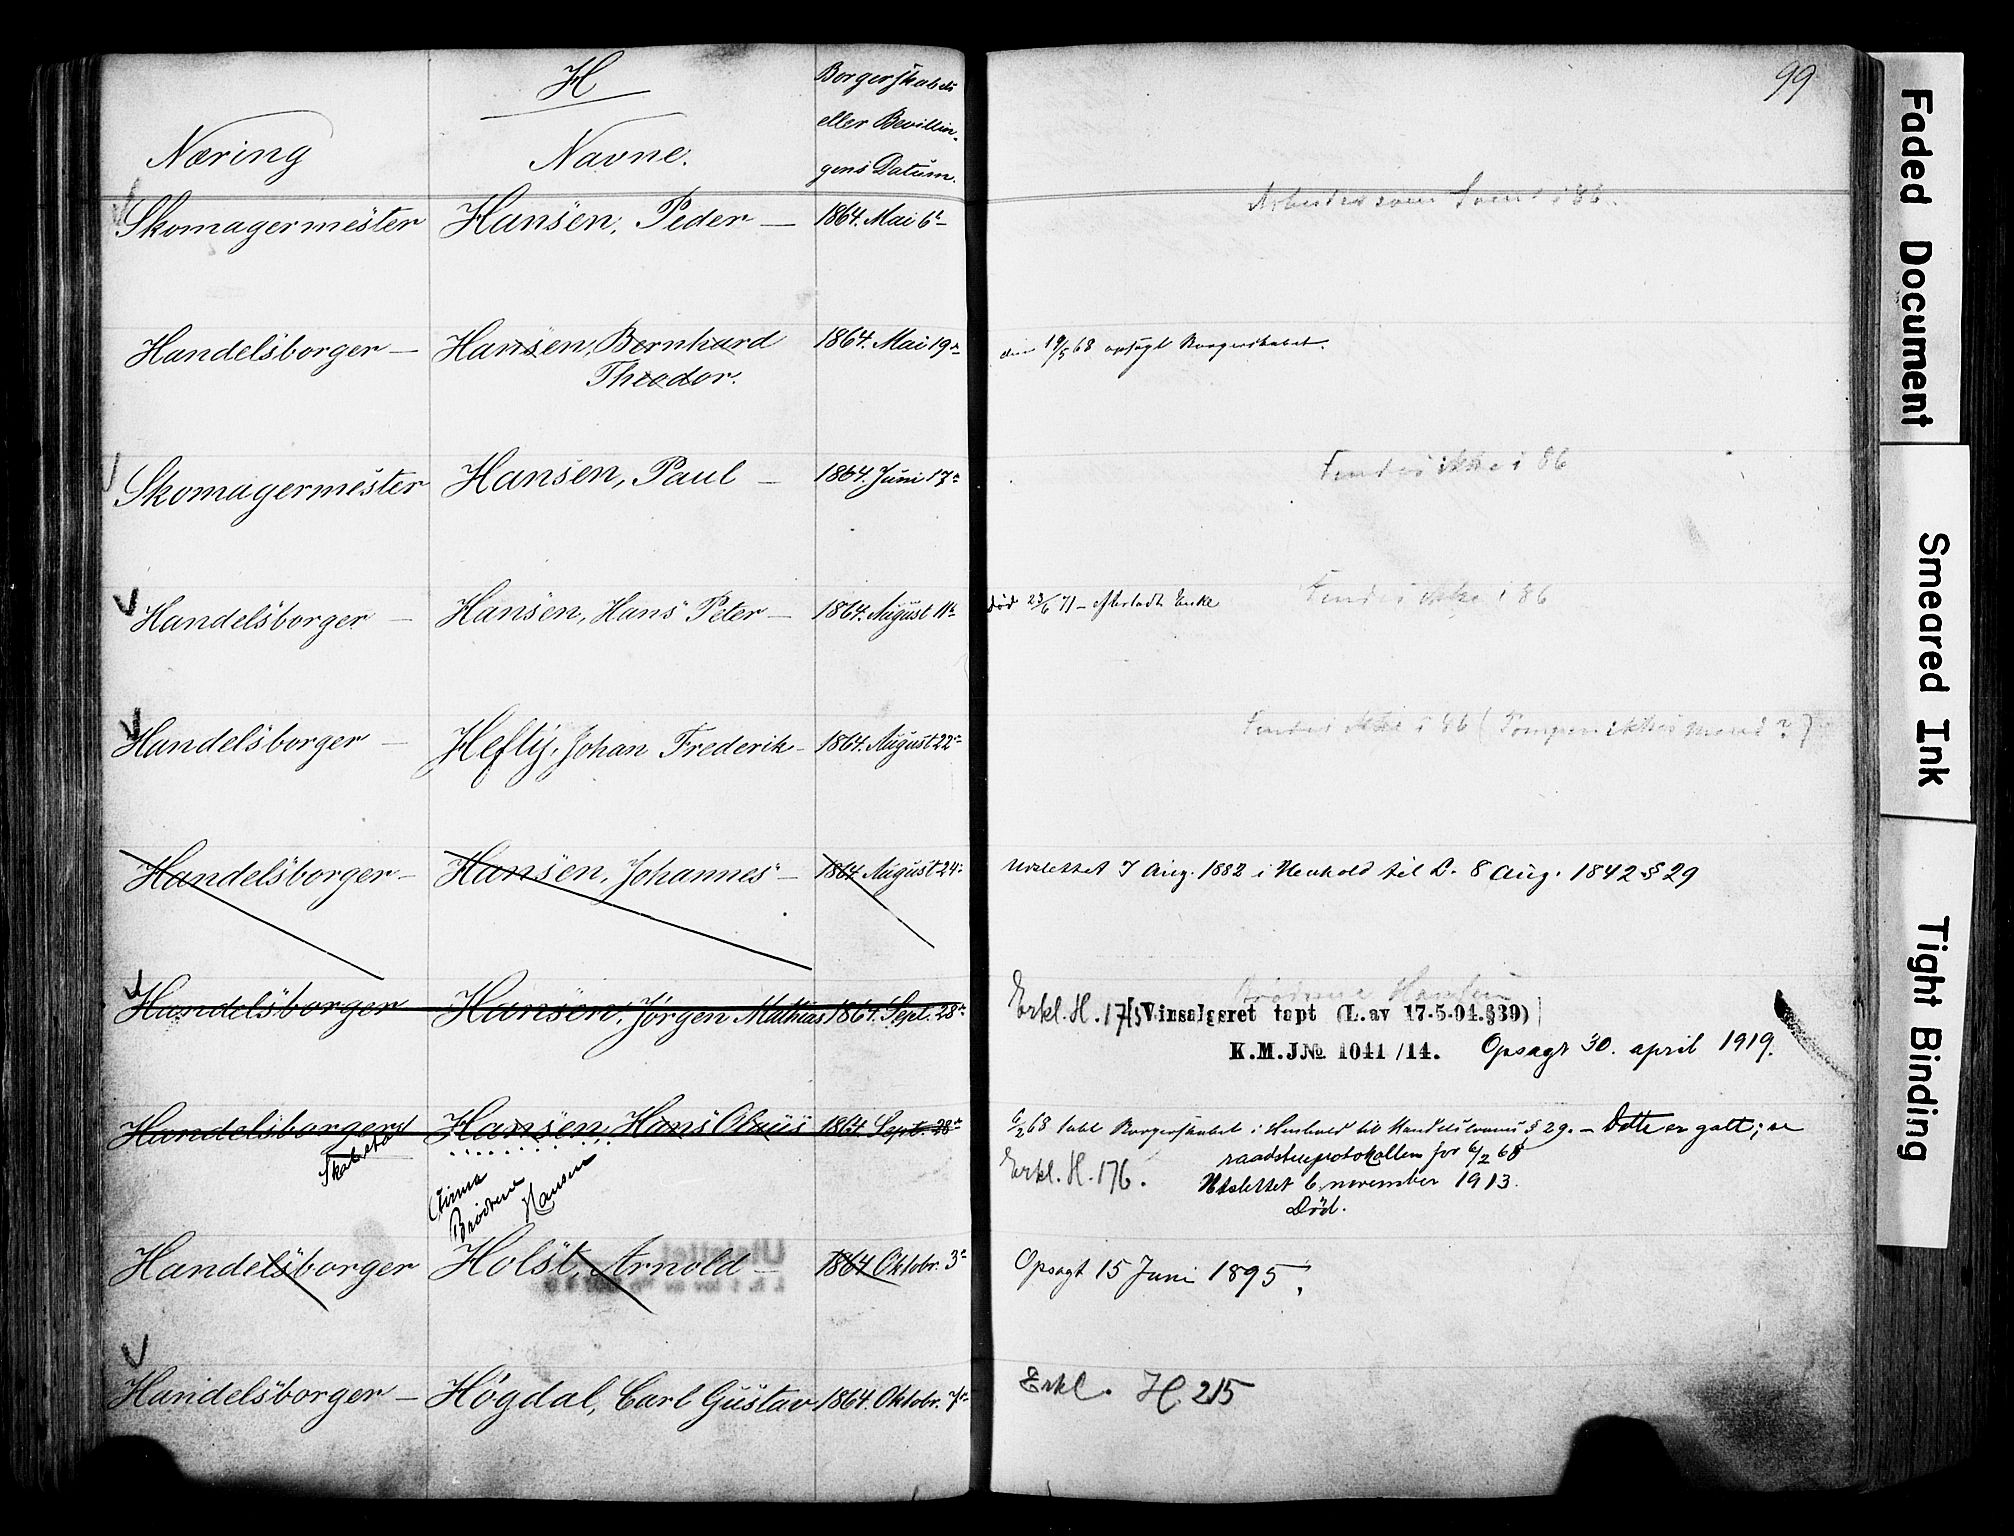 SAO, Kristiania magistrat, F/Fb/L0004: Borgerrulle, 1860-1879, p. 101